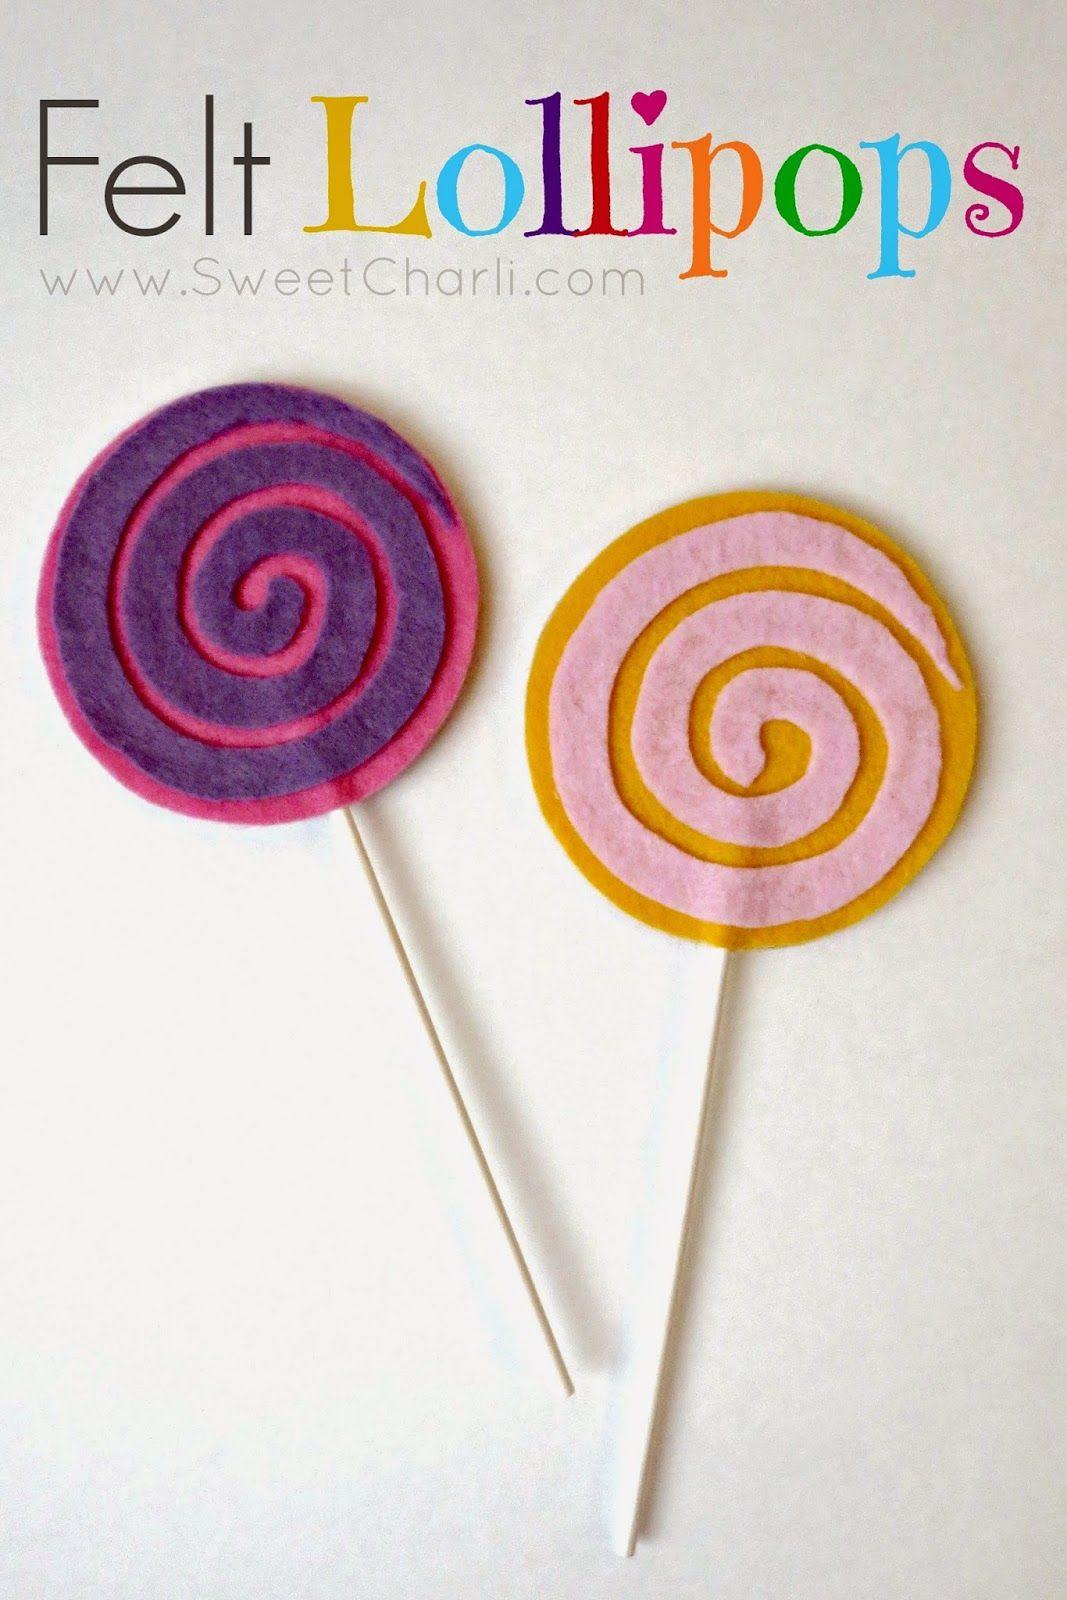 Diy No Sew Felt Lollipops For Pretend Play Feltfood Lollipops